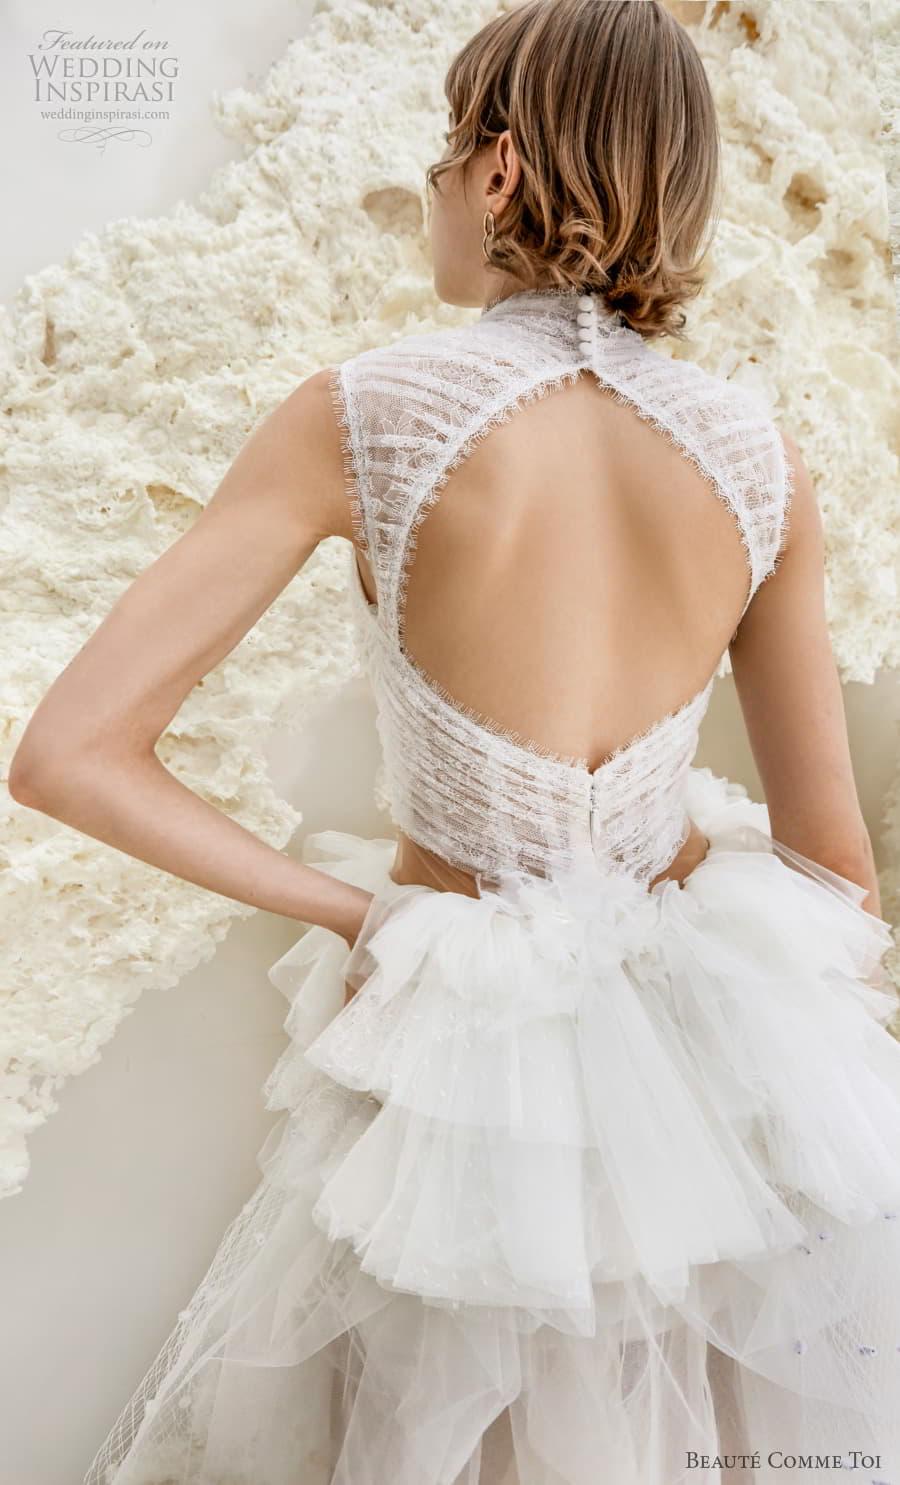 beaute comme toi spring 2022 bridal sleeveless high neck ruched bodice pretty short wedding dress ruffled skirt keyhole back (galina) zbv